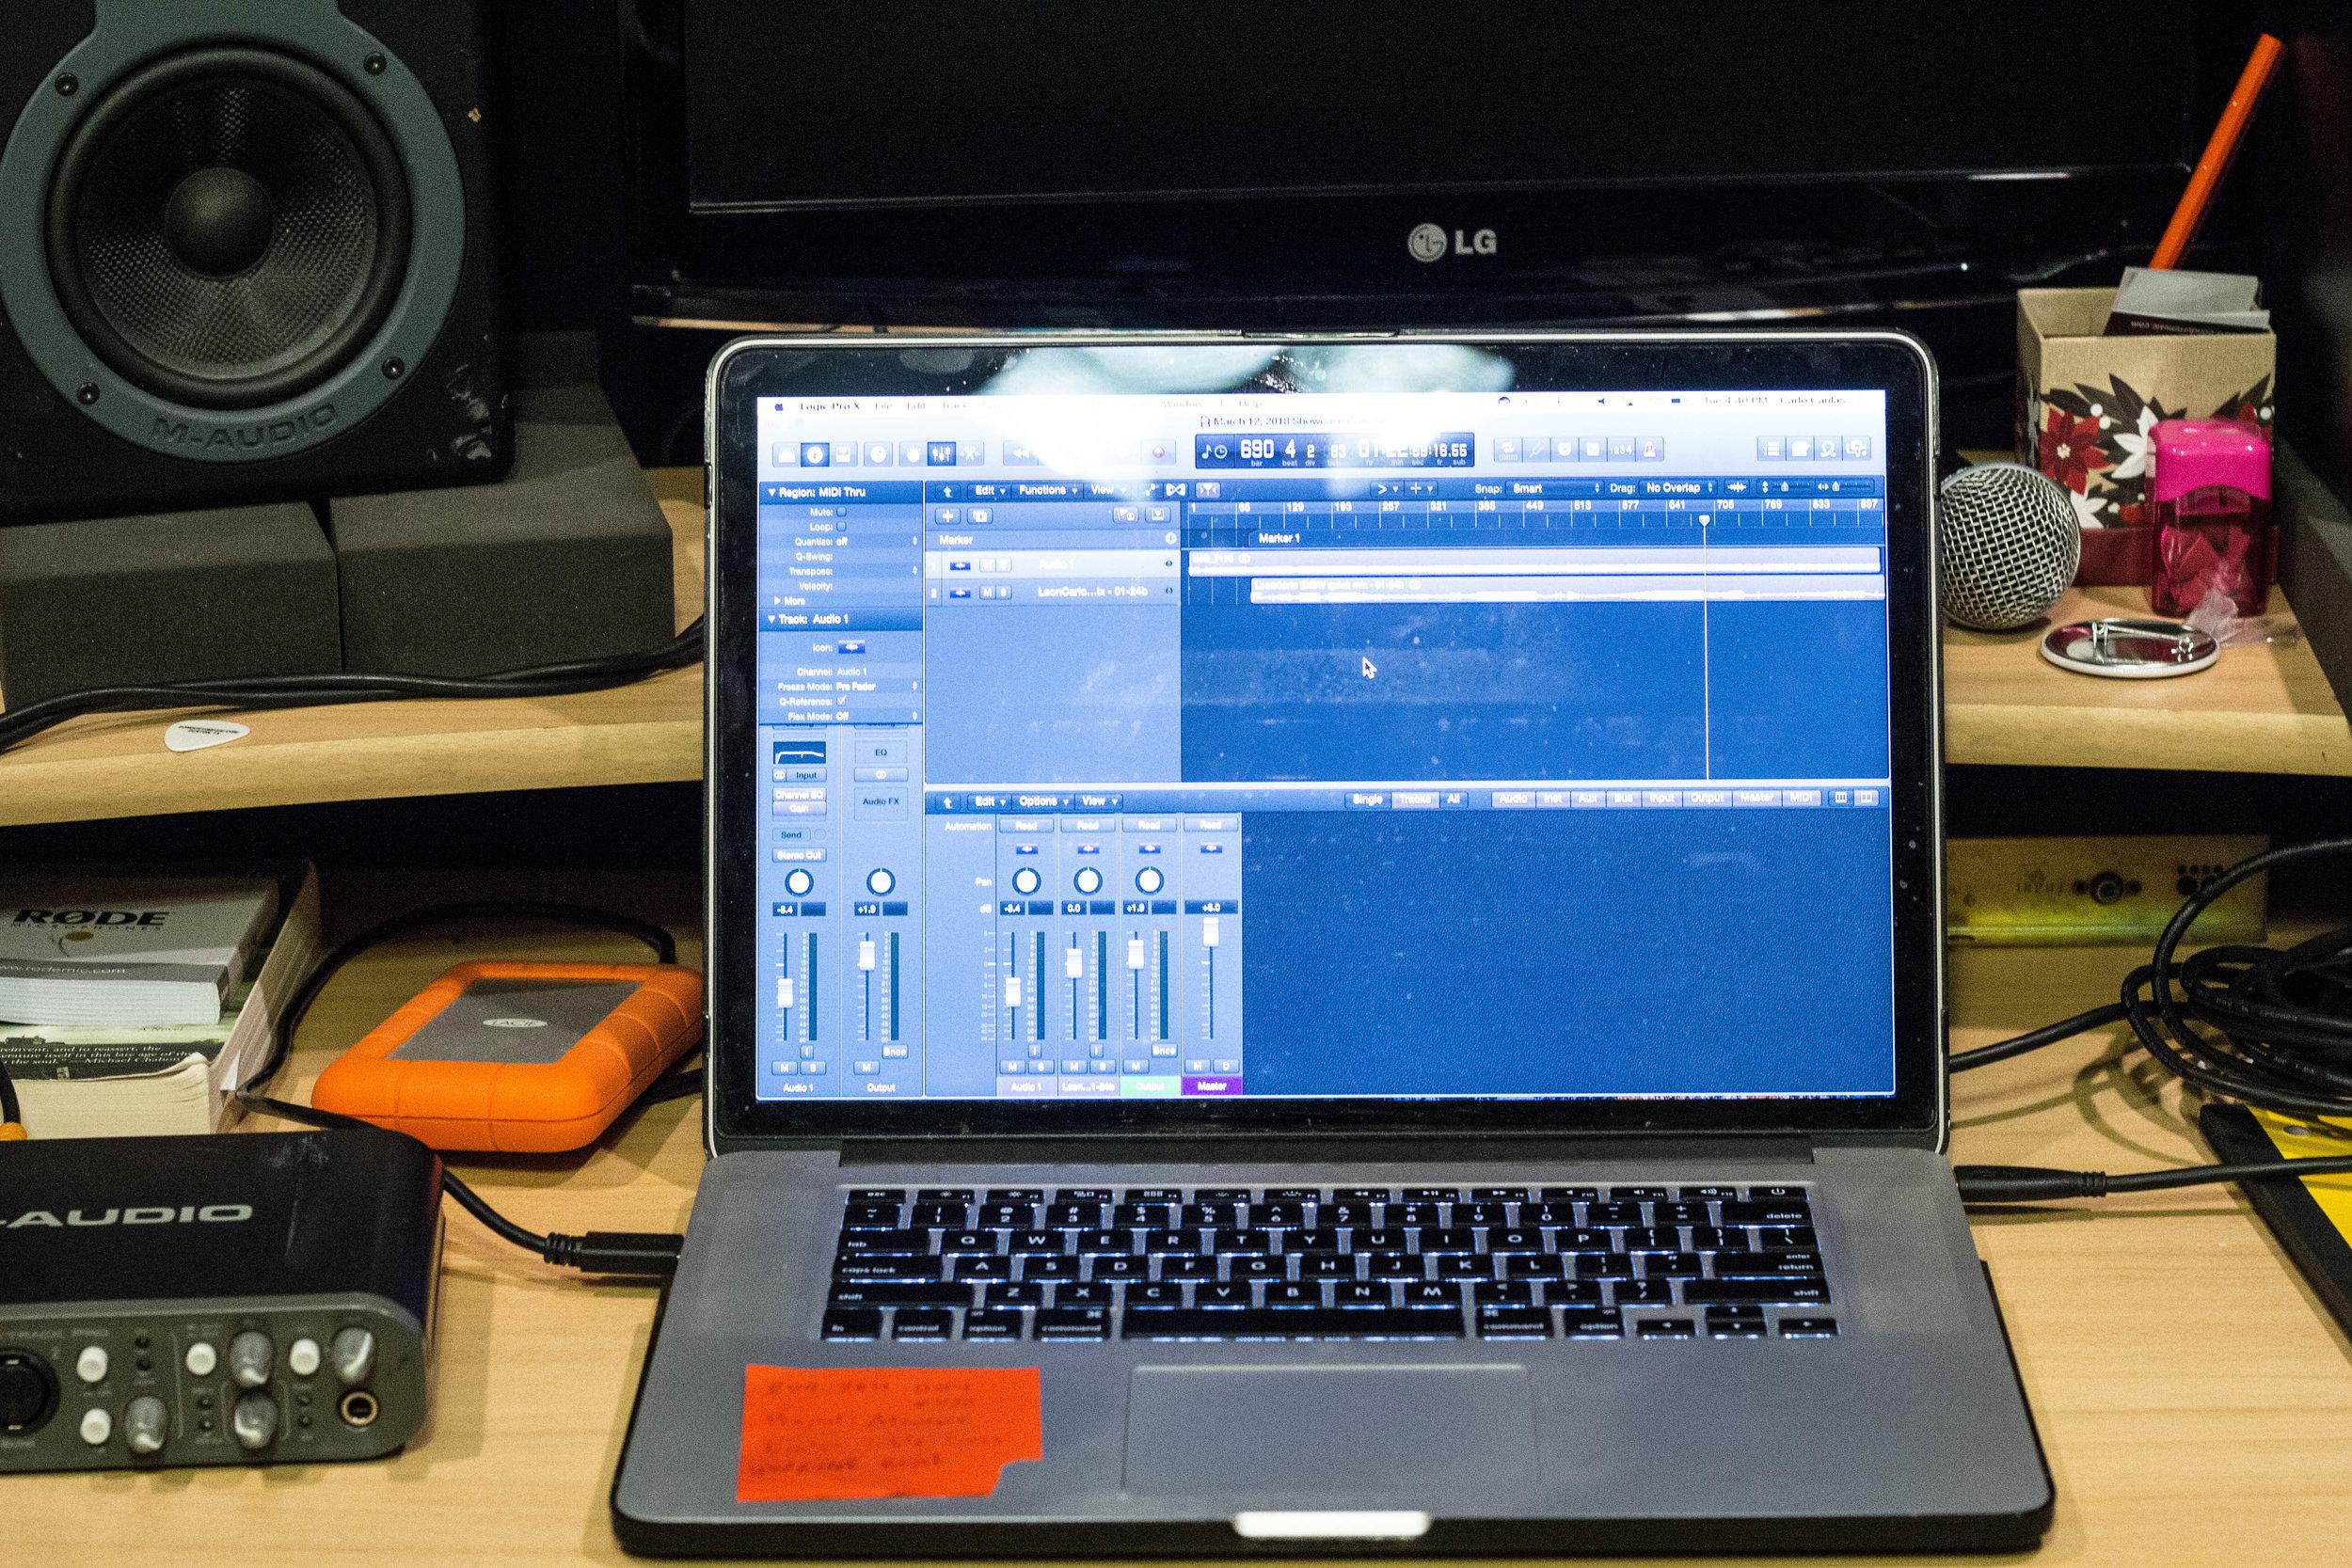 AUDIO INTERFACE -  M-Audio Fasttrack Pro 2   Software - Logic Pro